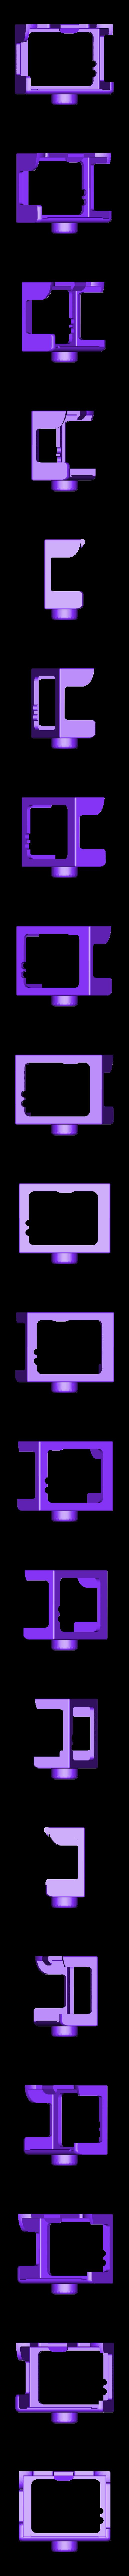 APEMAN-TRAWO-Cage-OV.stl Download free STL file APEMAN TRAWO A100 Cage • 3D print design, TASPP